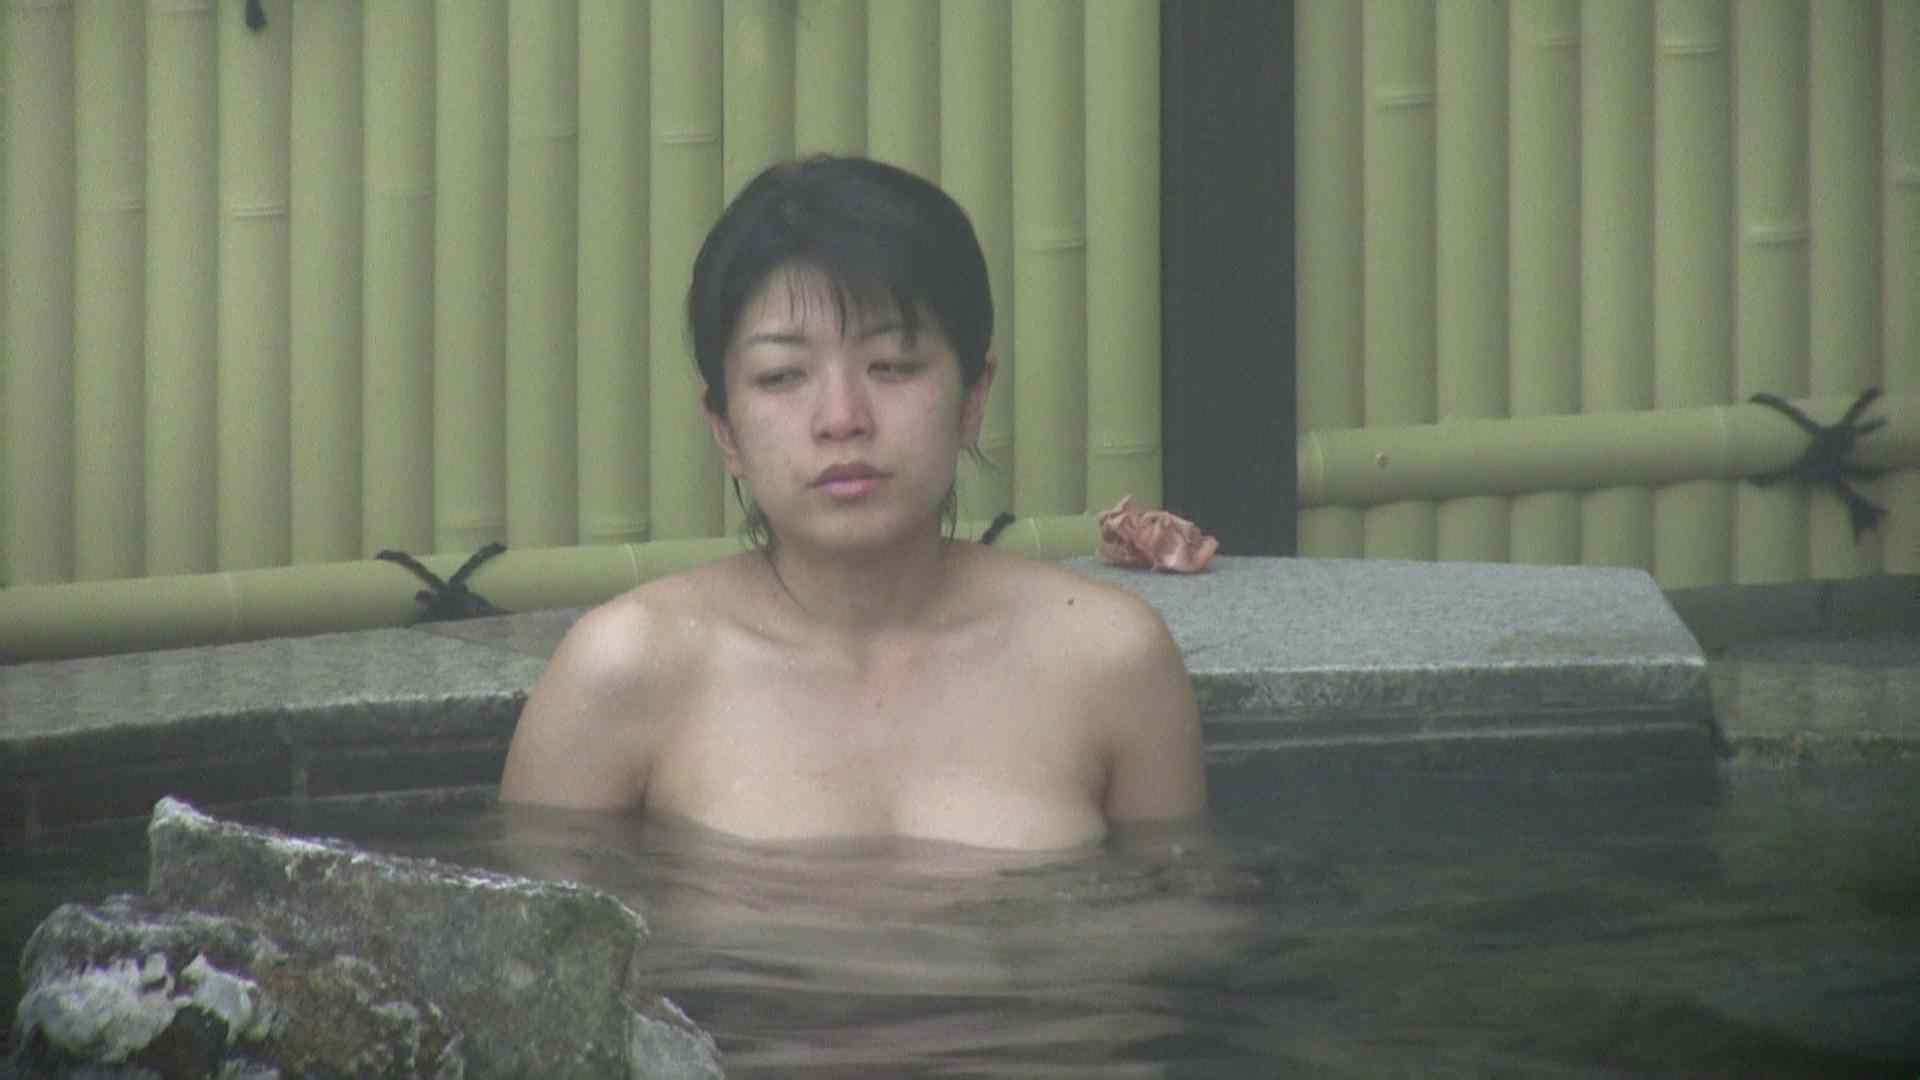 Aquaな露天風呂Vol.585 露天 アダルト動画キャプチャ 78PICs 71